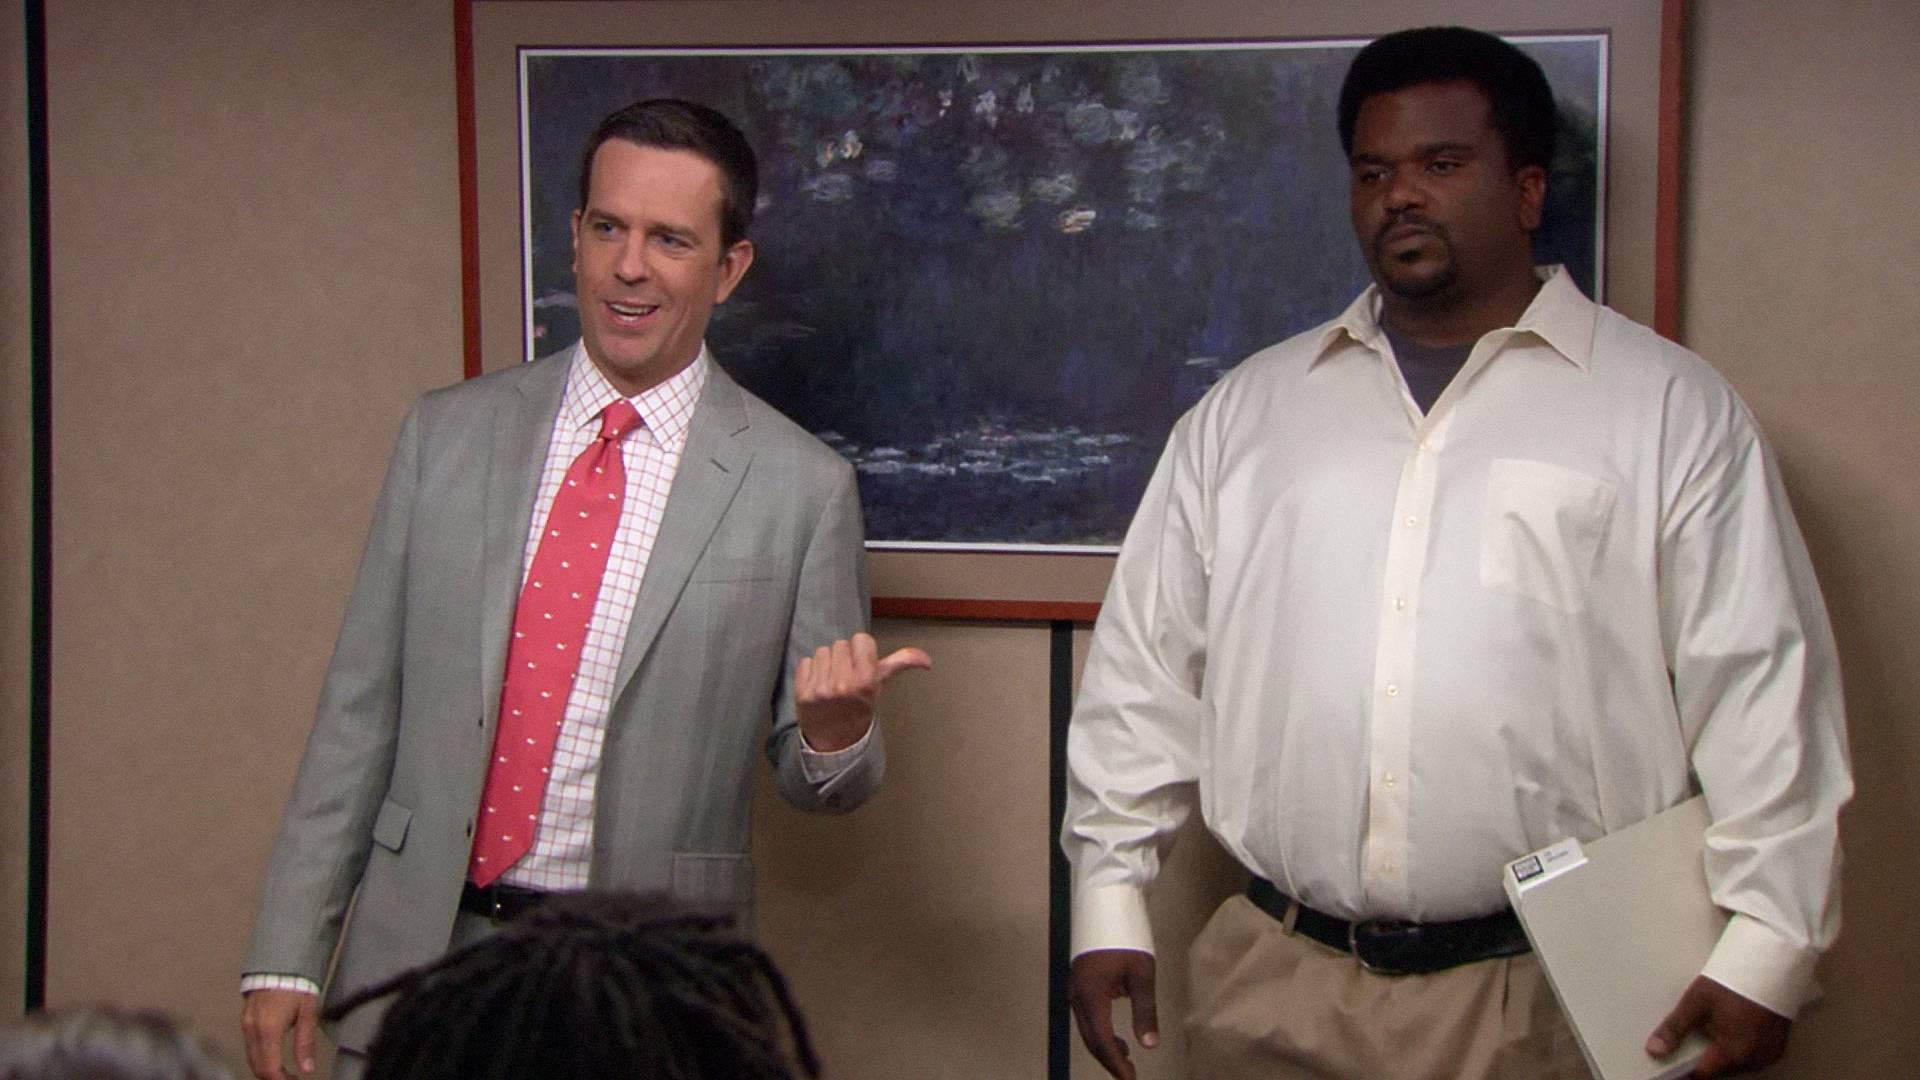 The Office Season 8 Episode 3